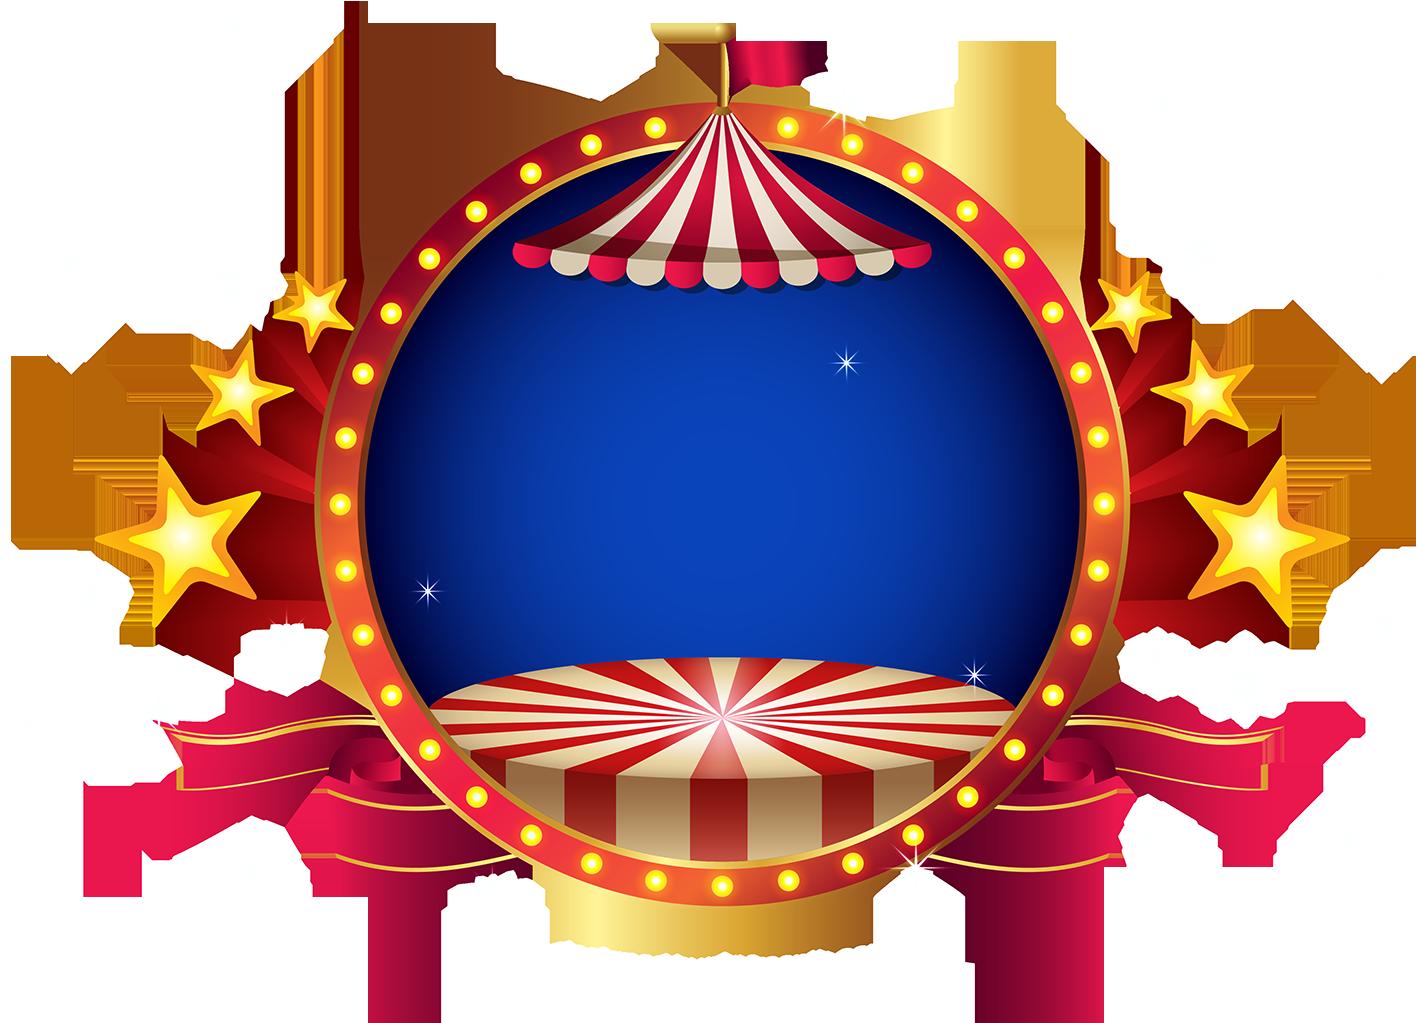 Molduras em png tema circo | Tema circo, Circo png, Festa ...